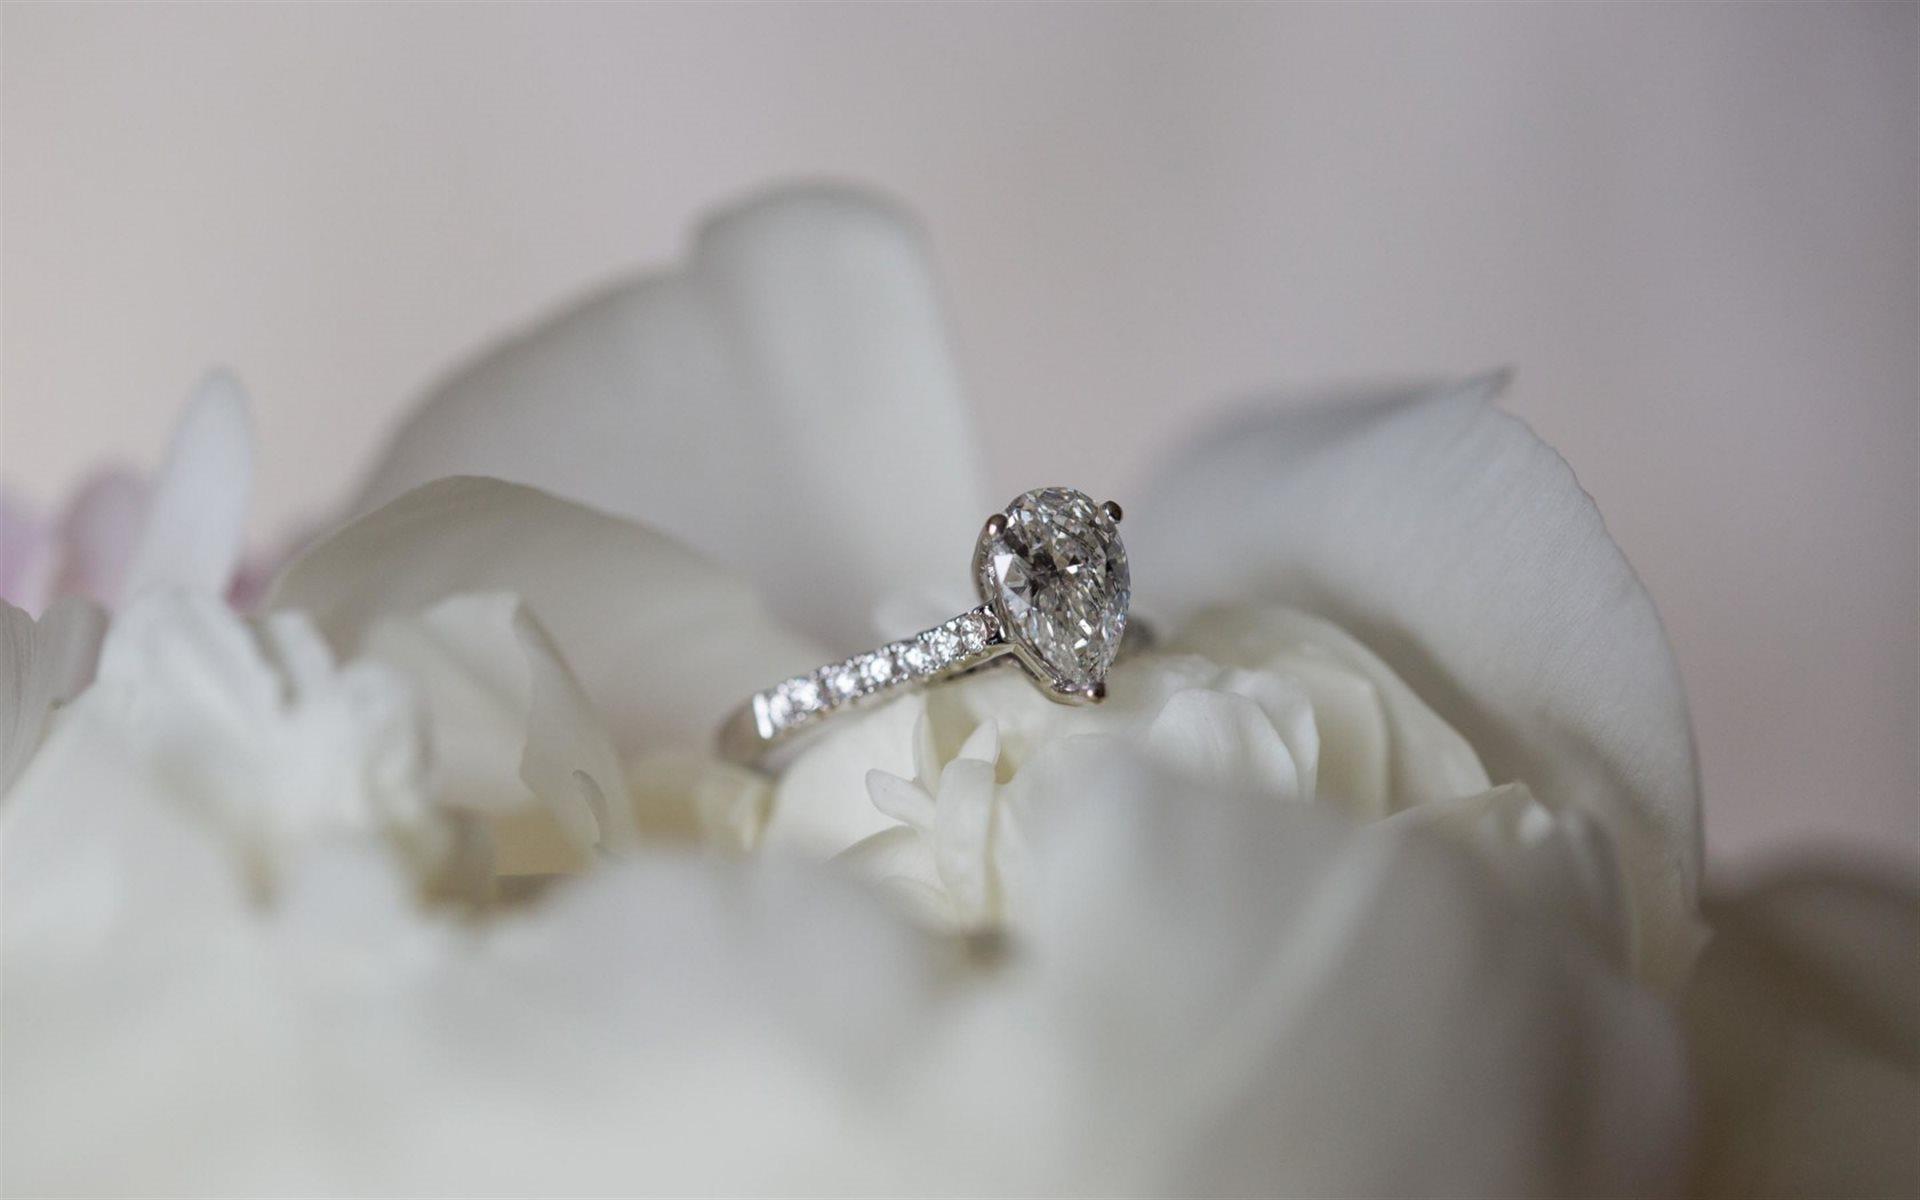 بالصور خلفيات زواج , صور خلفيات مميزه لا مثيل لها لاجمل عروسين 3626 10